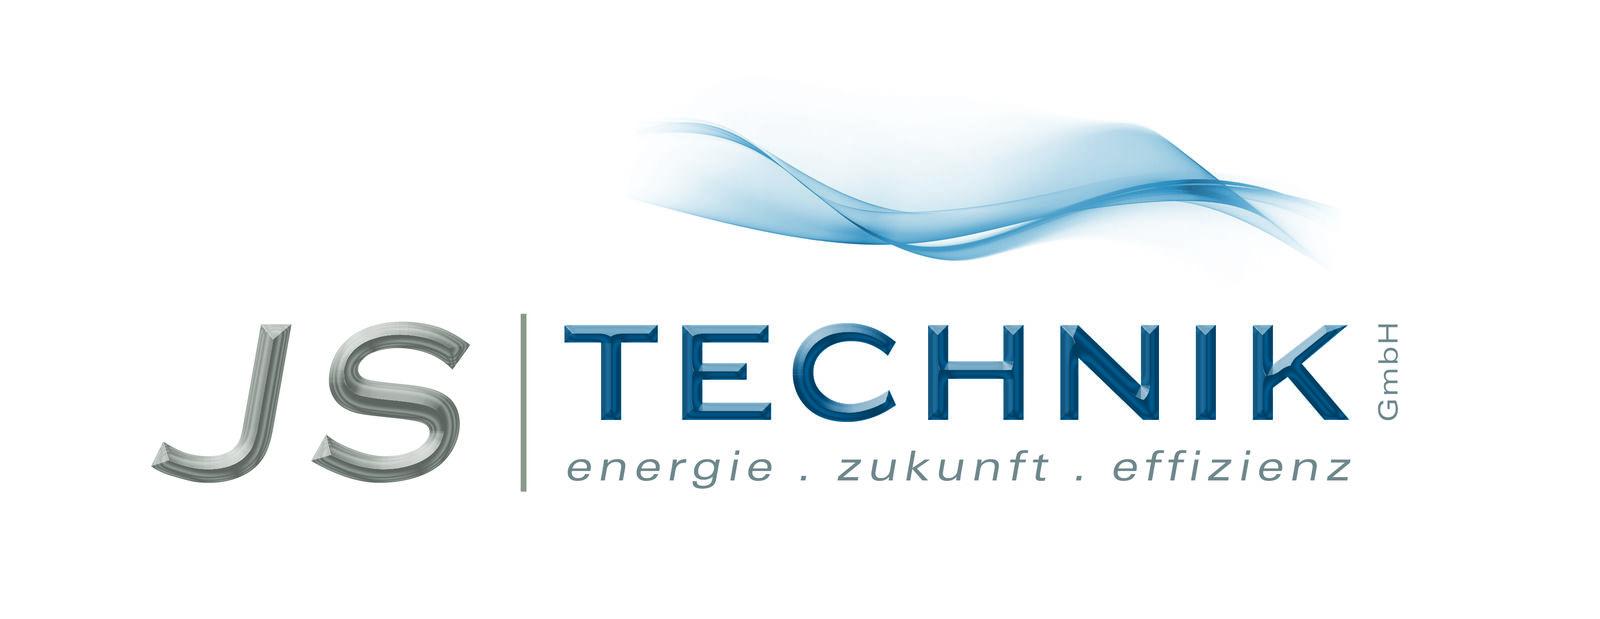 JS-Technik GmbH